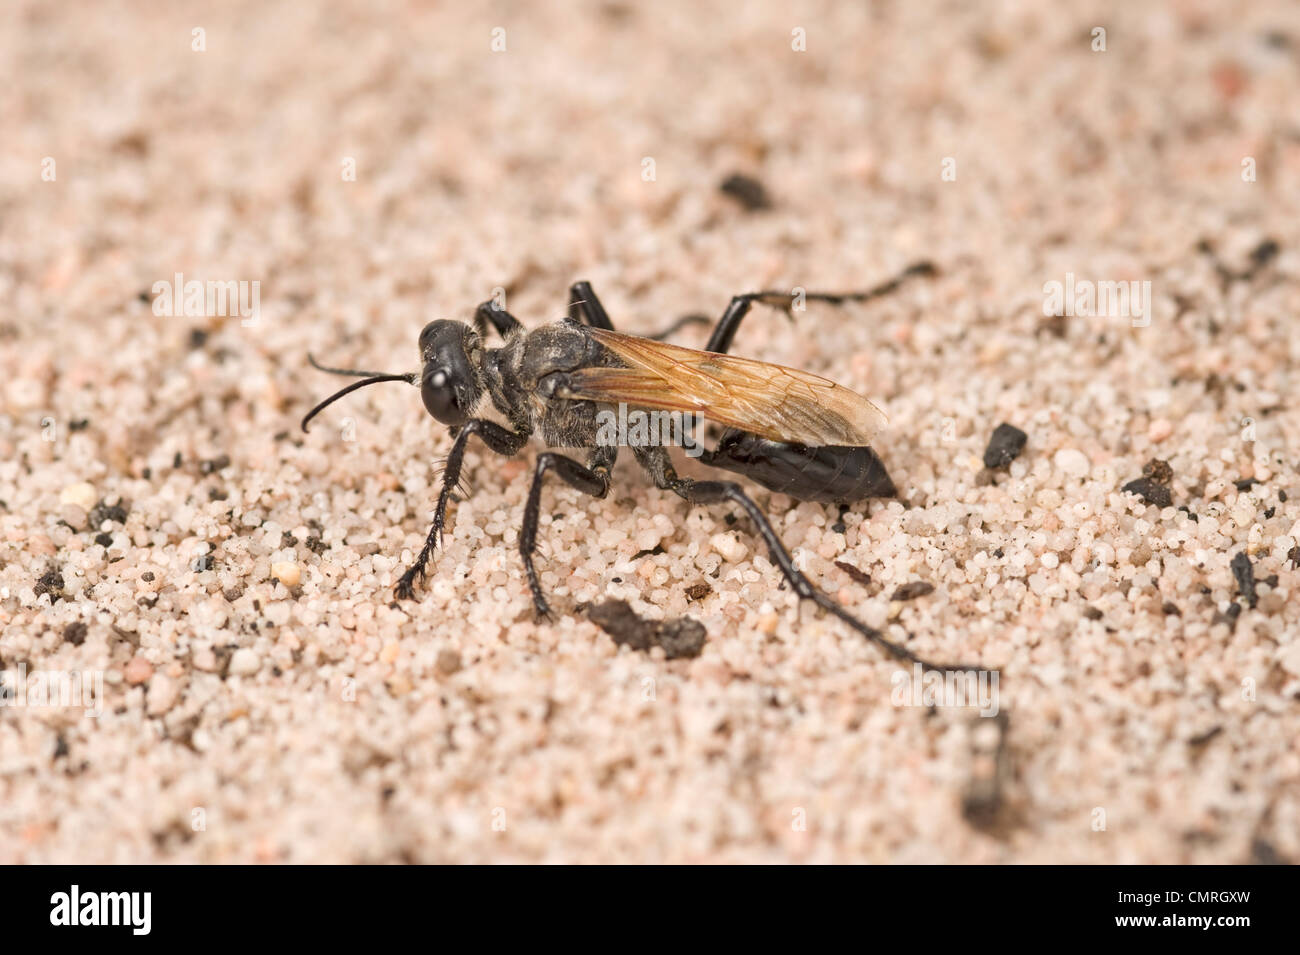 Australian digger wasp - a predator of locusts - Stock Image